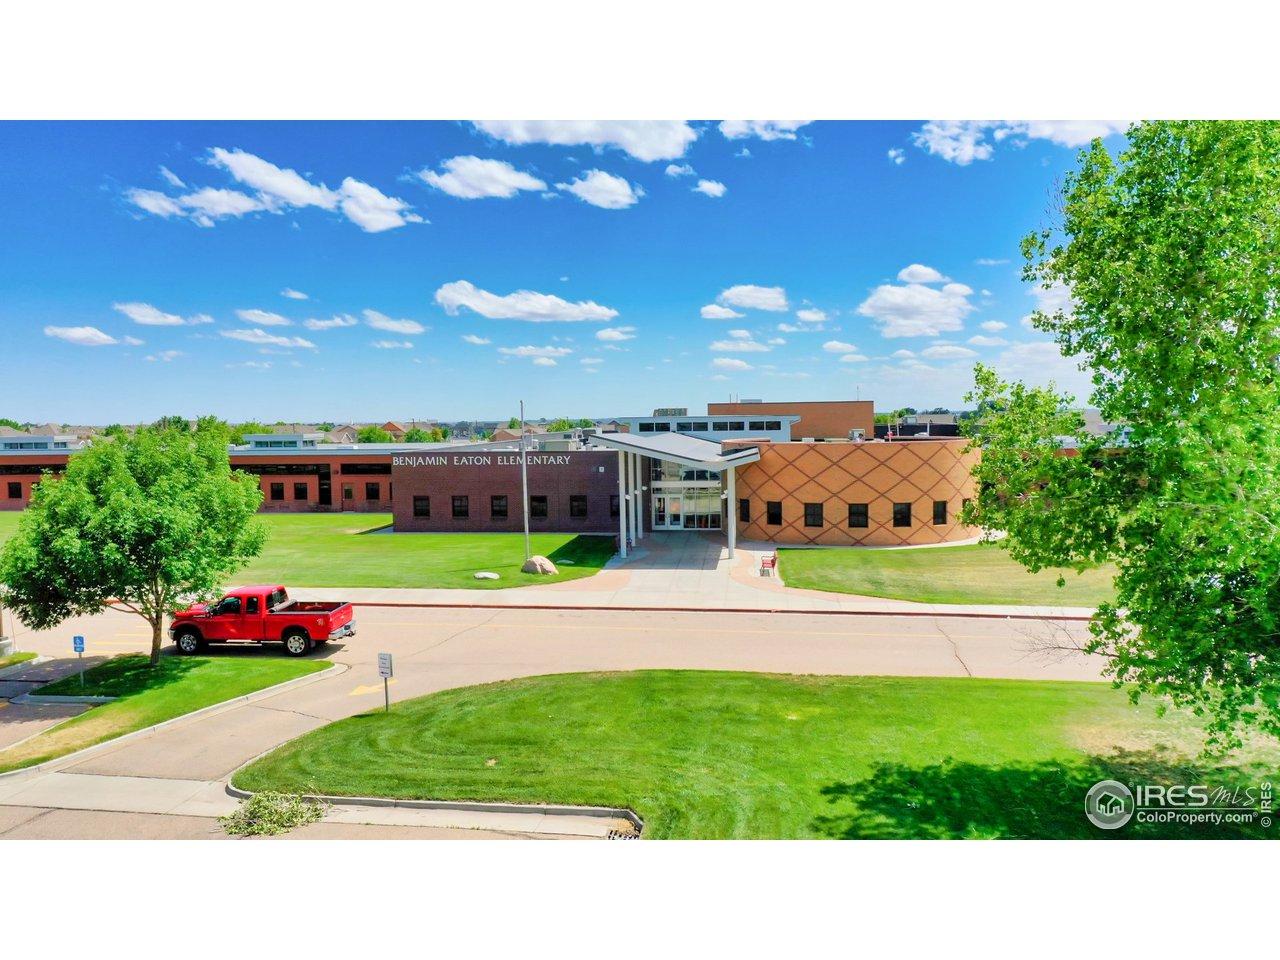 Community Rec Center